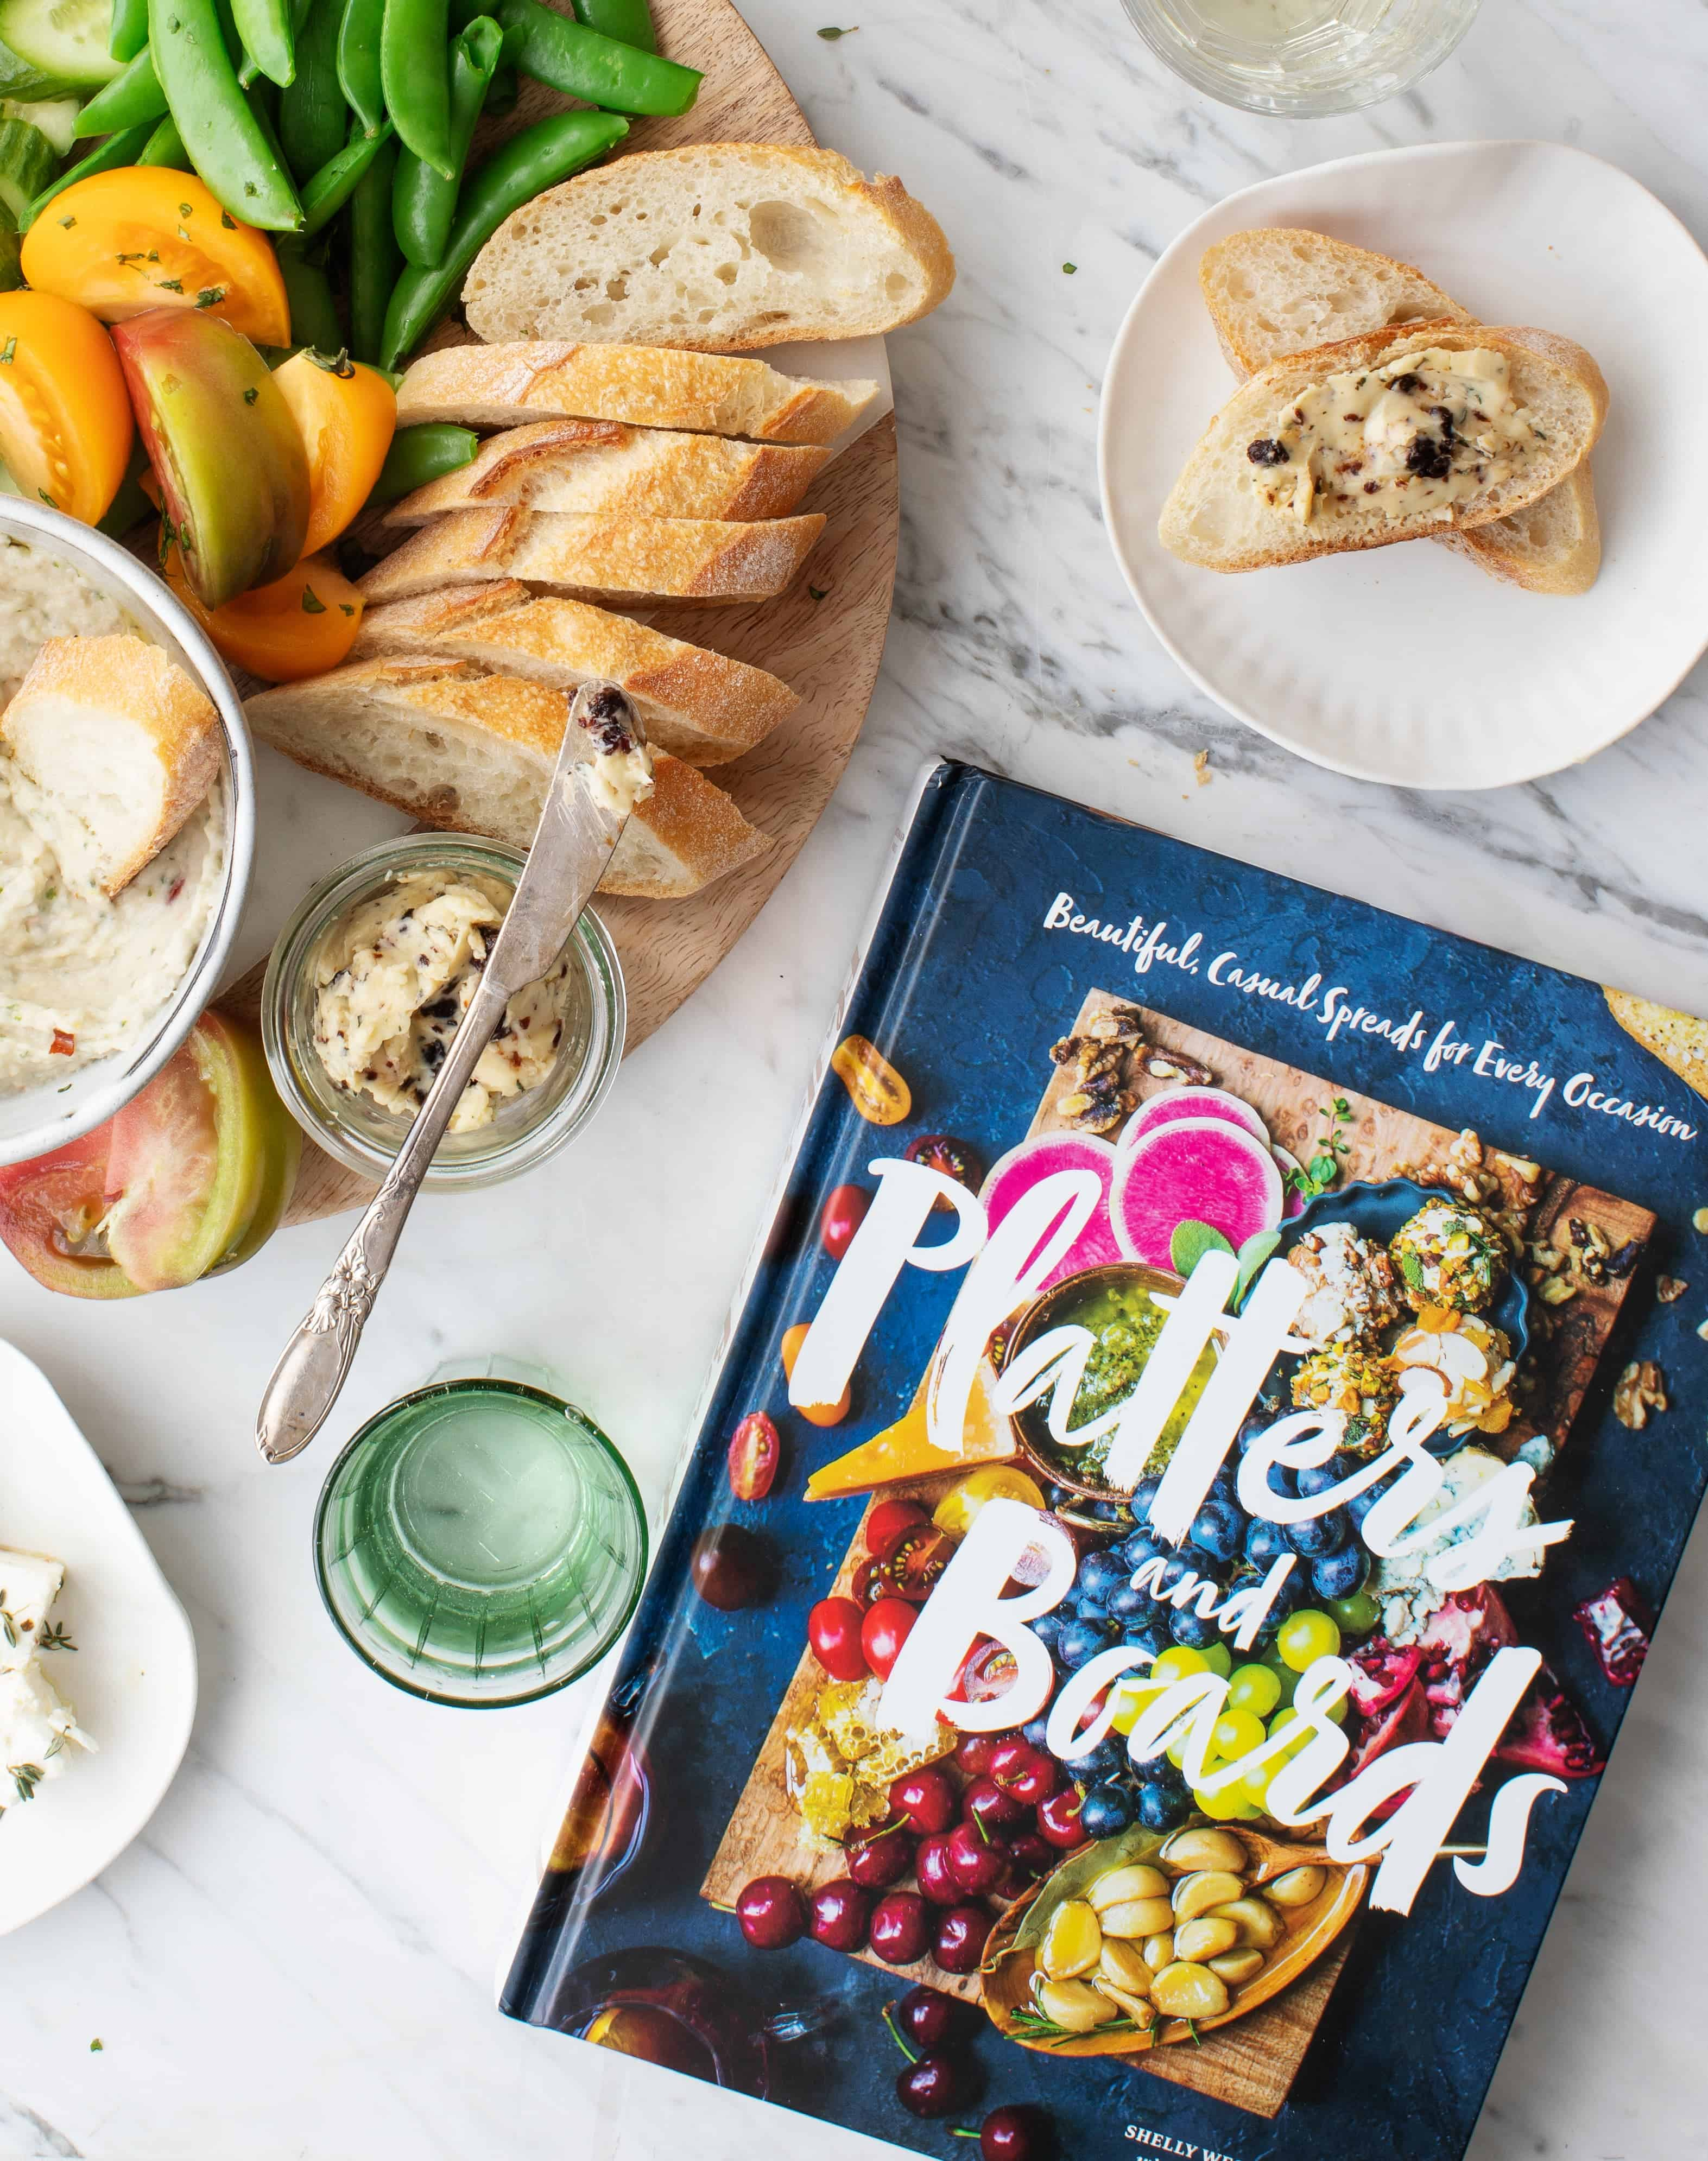 Ultimate Crudite Platter Recipes By Love And Lemons